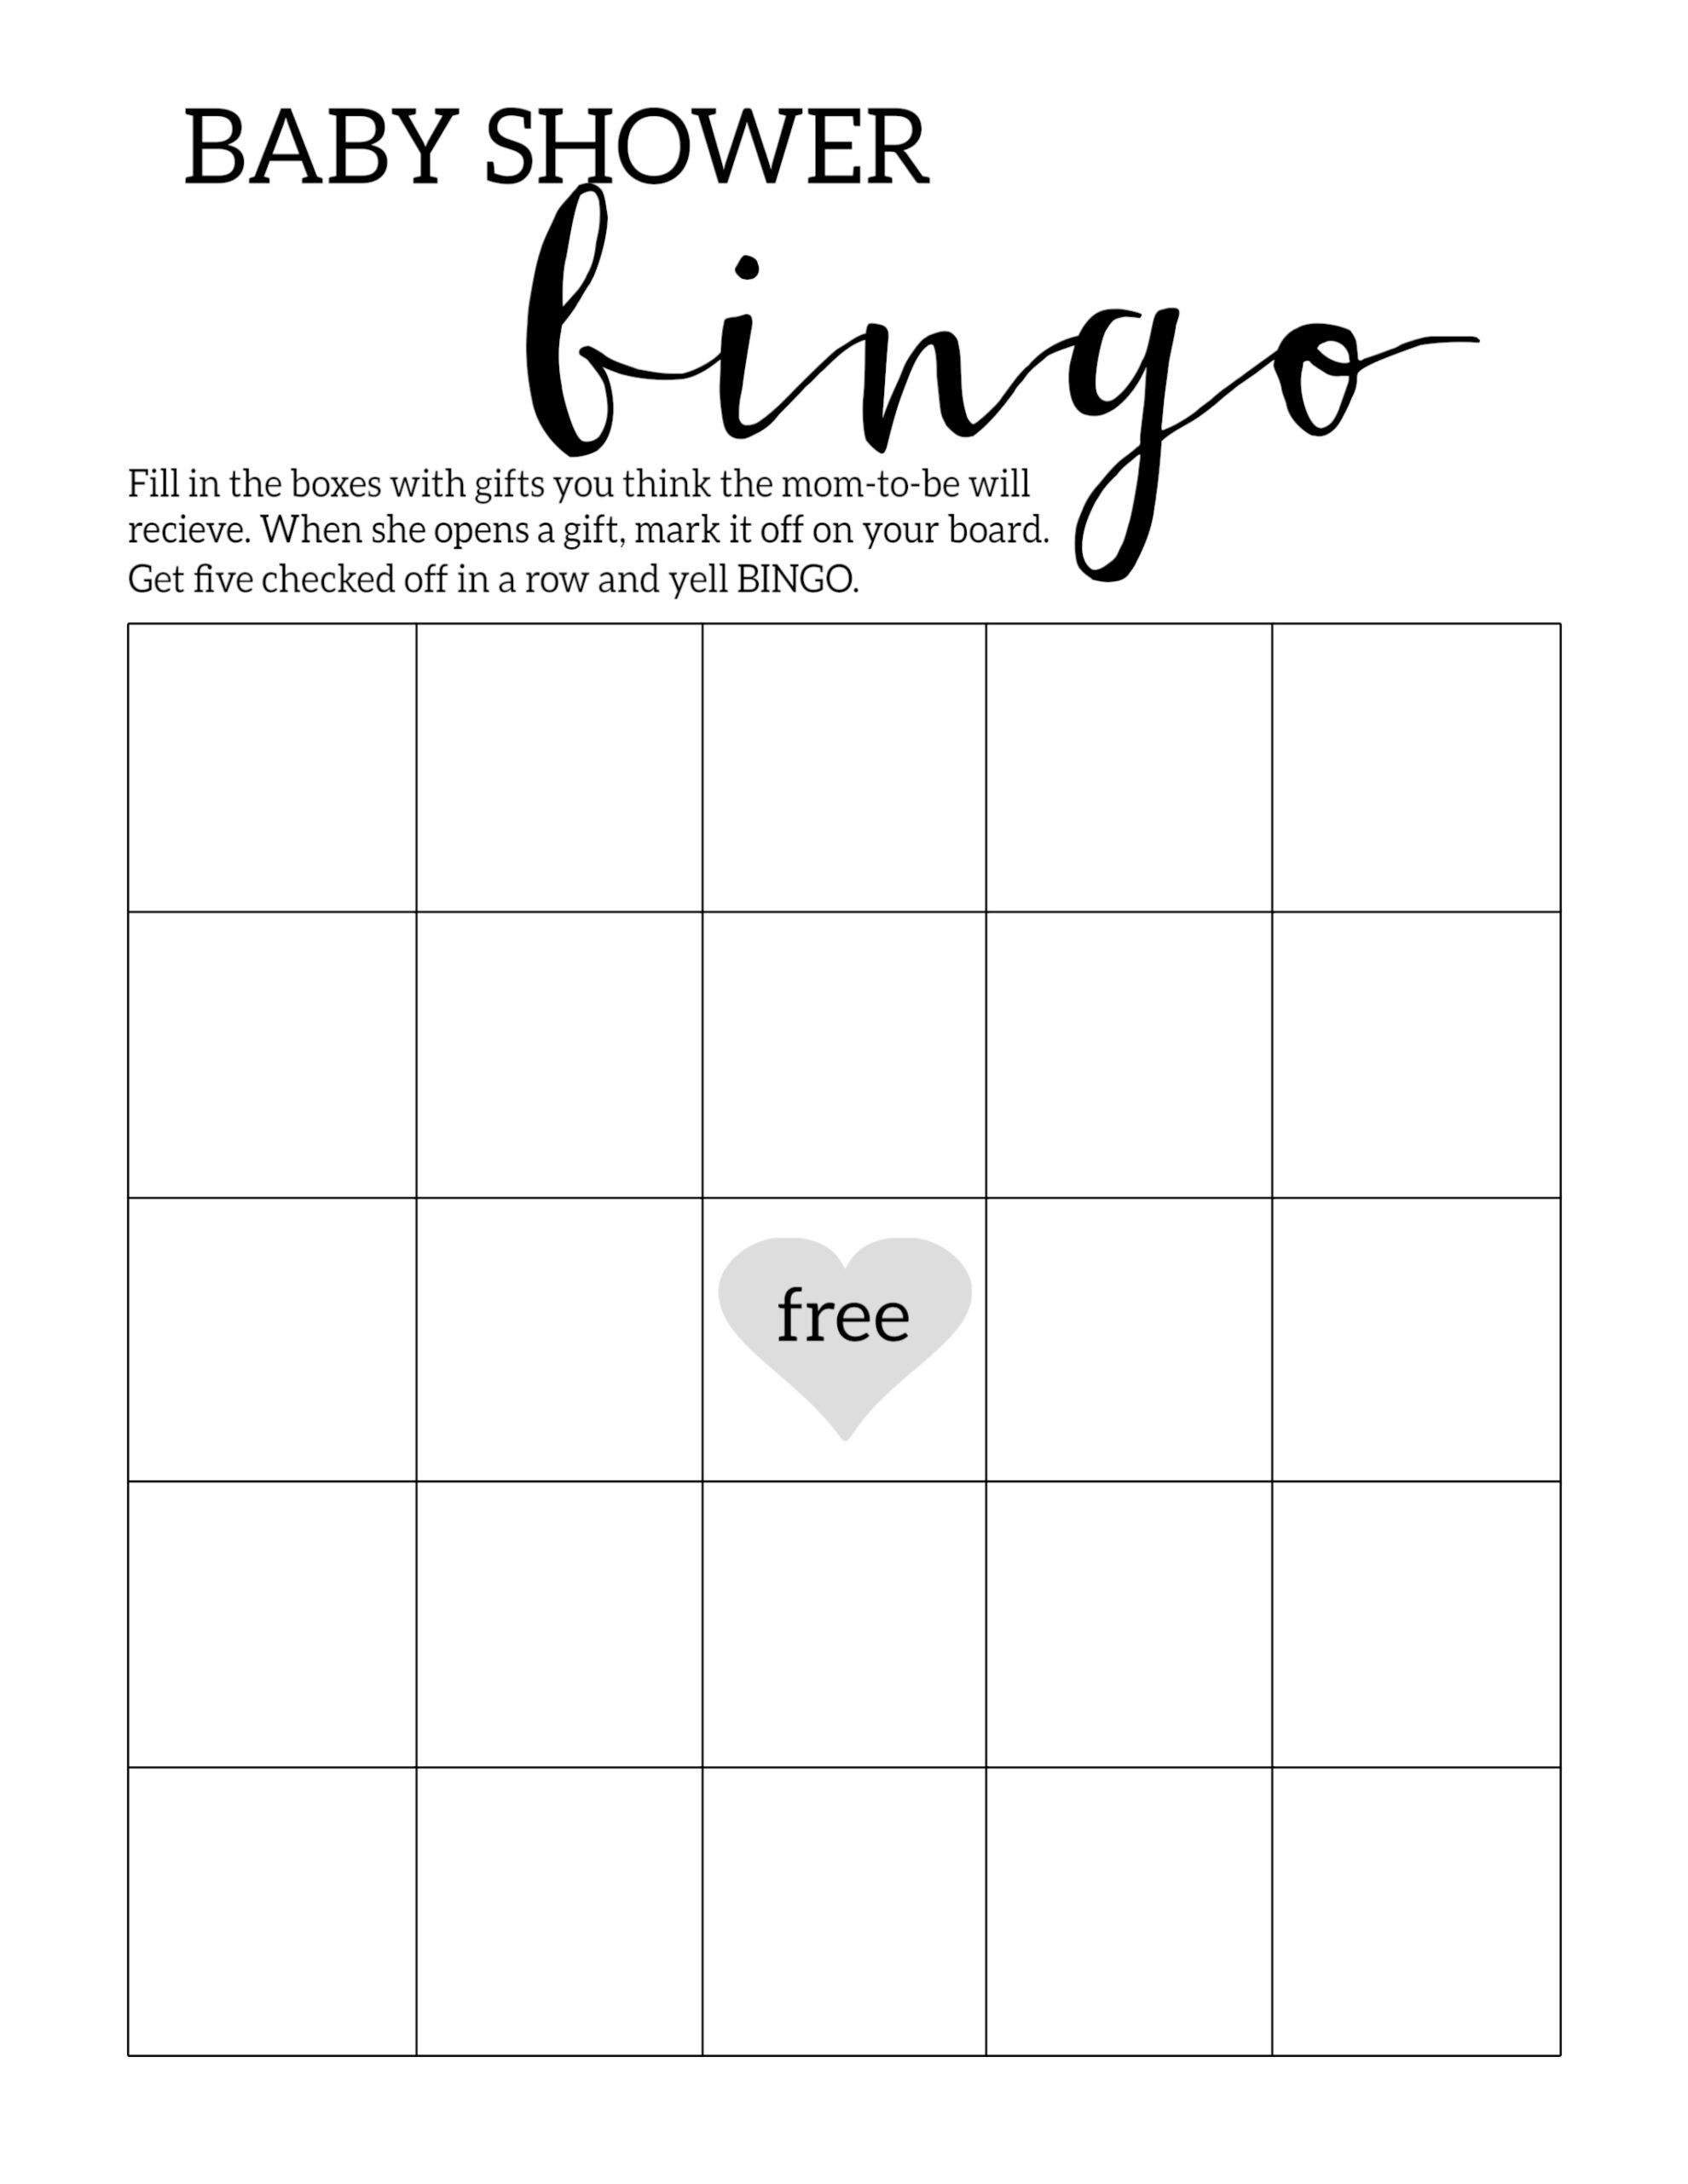 Printable Baby Bingo Template : printable, bingo, template, Shower, Bingo, Printable, Cards, Template, Paper, Trail, Design